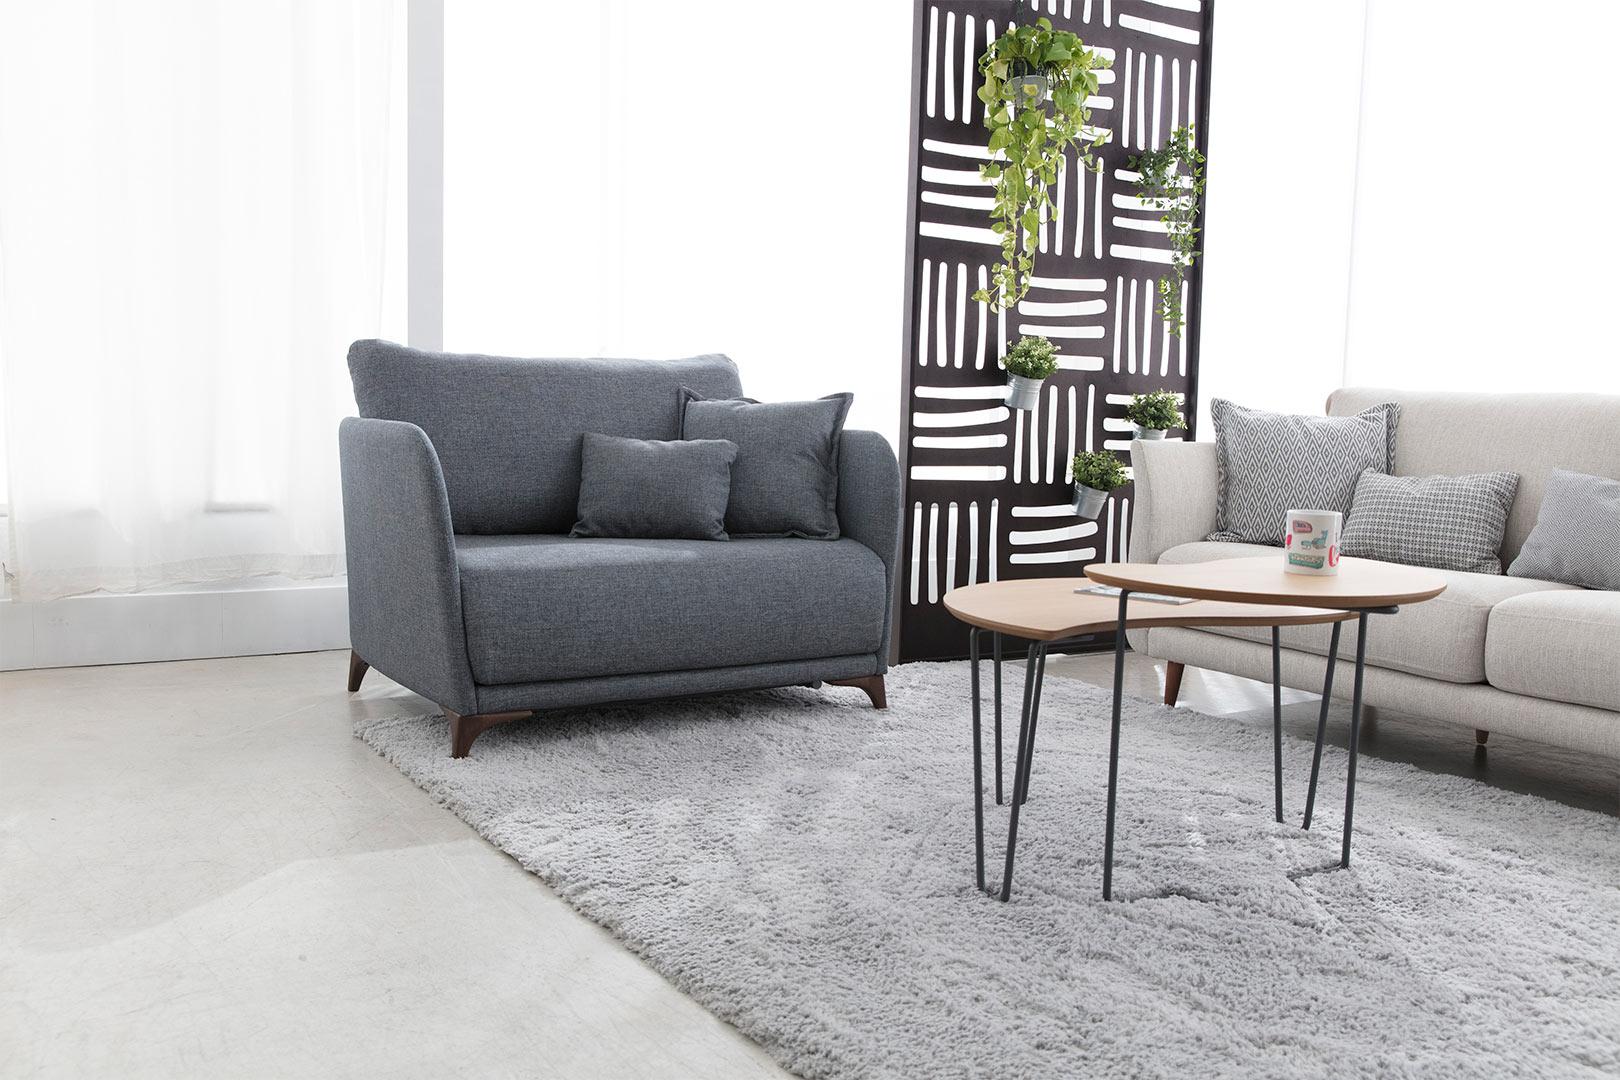 Gala sillón cama 2020 01